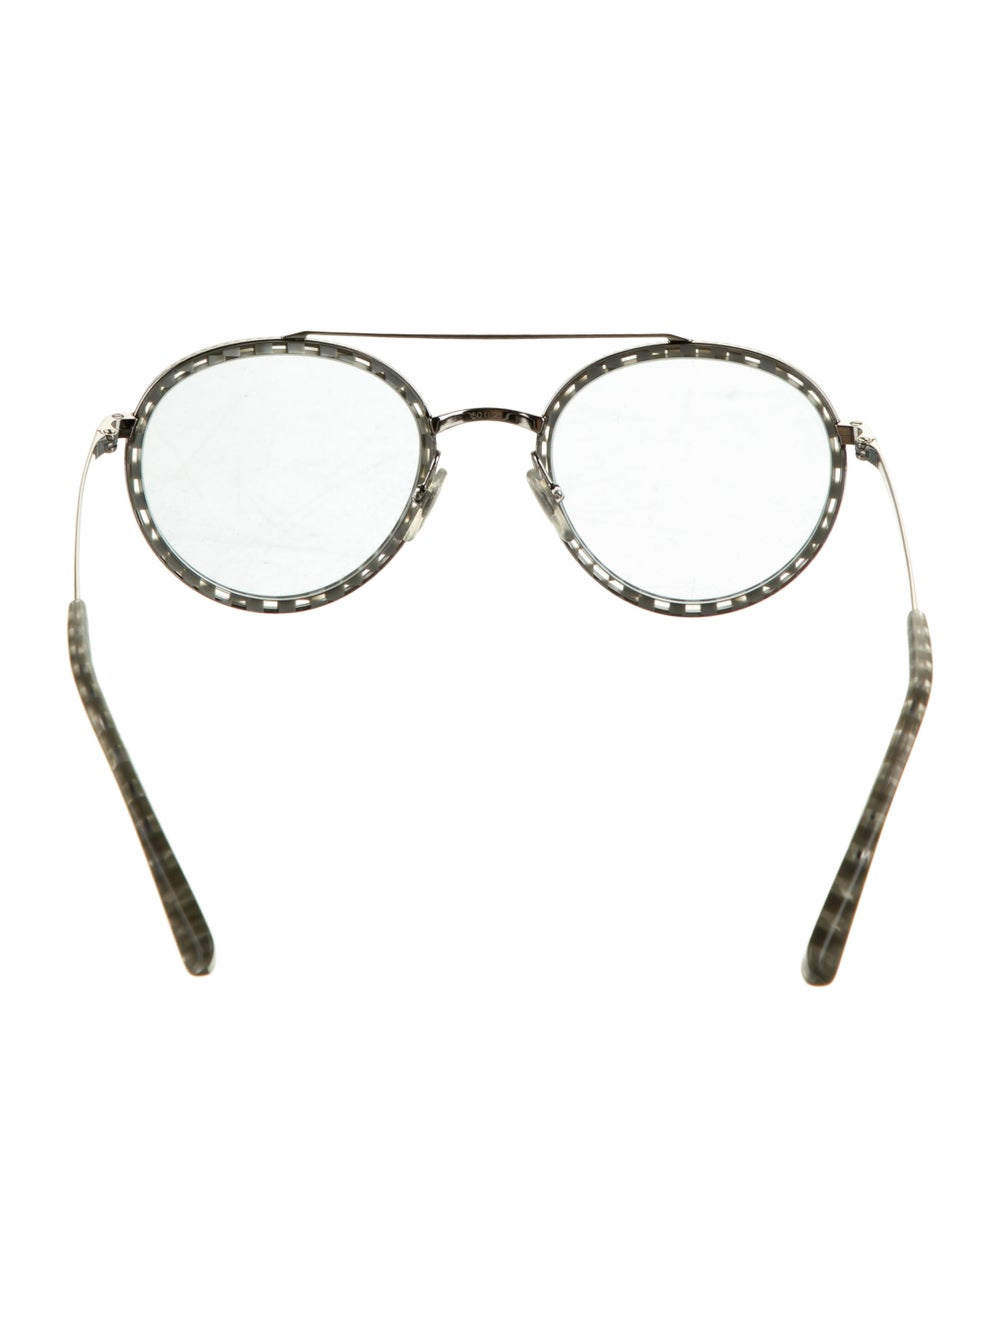 Alain Mikli Tinted Round Sunglasses Silver - image 3